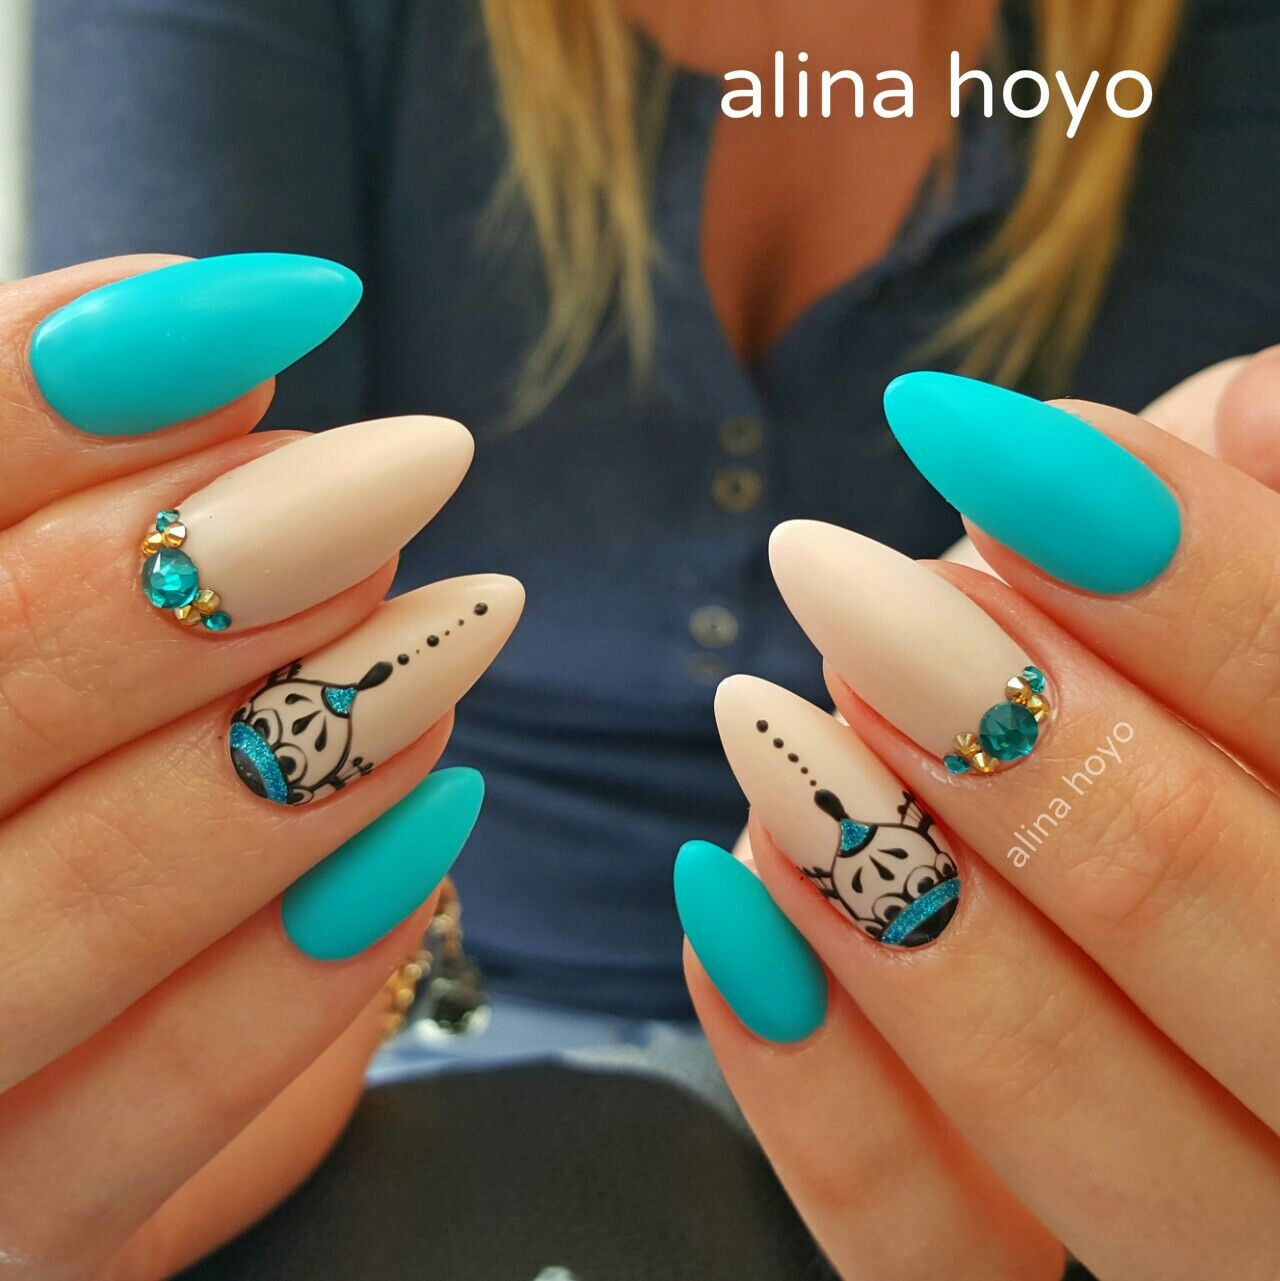 robinJADONjames | paznokcie | Pinterest | Manicure, Nail nail and ...